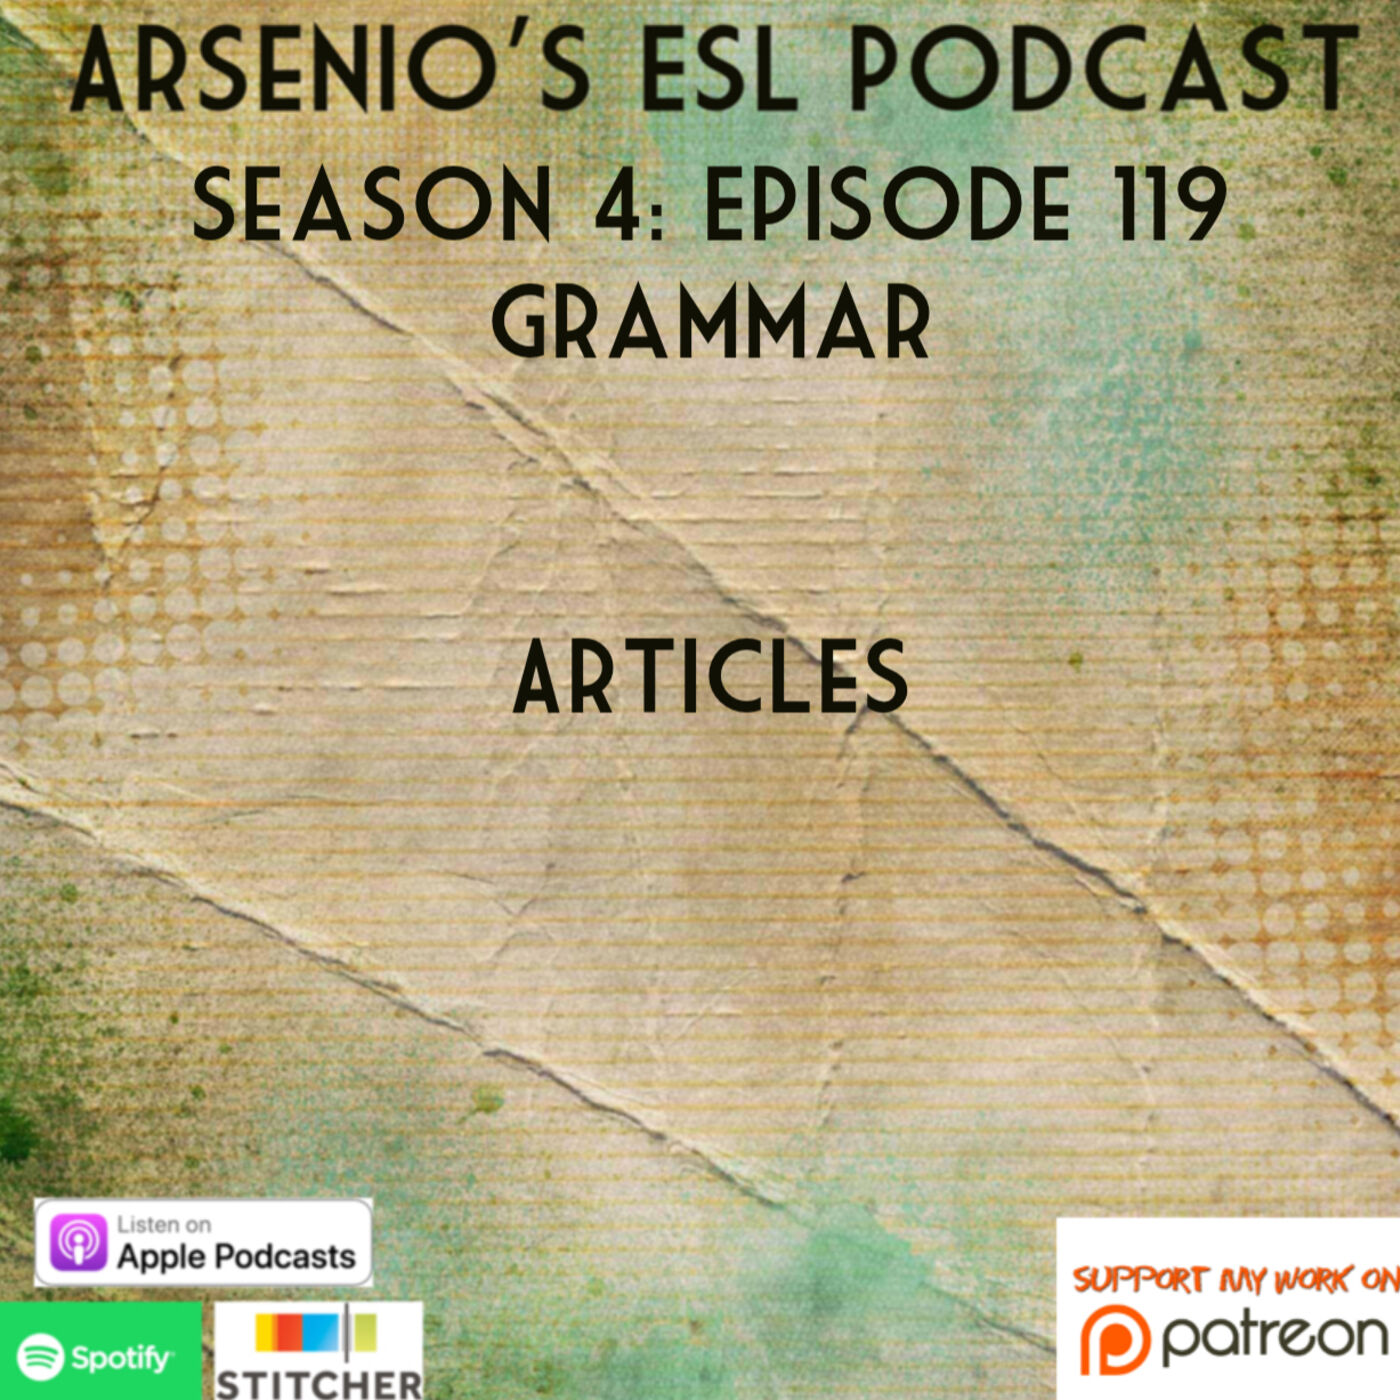 Arsenio's ESL Podcast: Season 4 - Episode 119 - Grammar - Articles (Upper Intermediate)